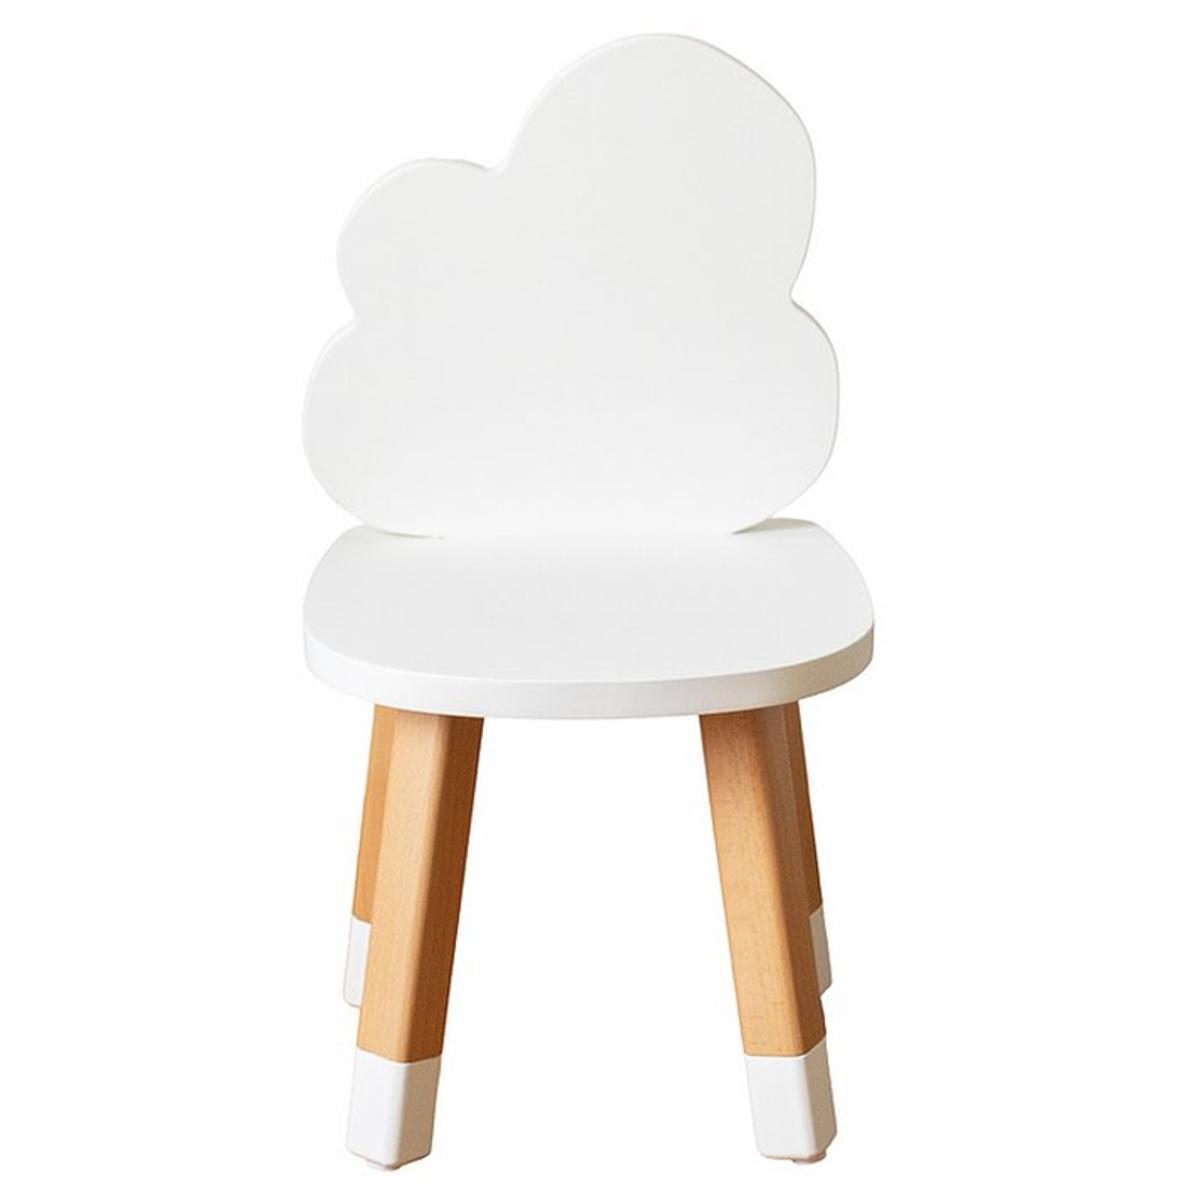 Table & Chaise Chaise Nuage - Blanc Chaise Nuage - Blanc